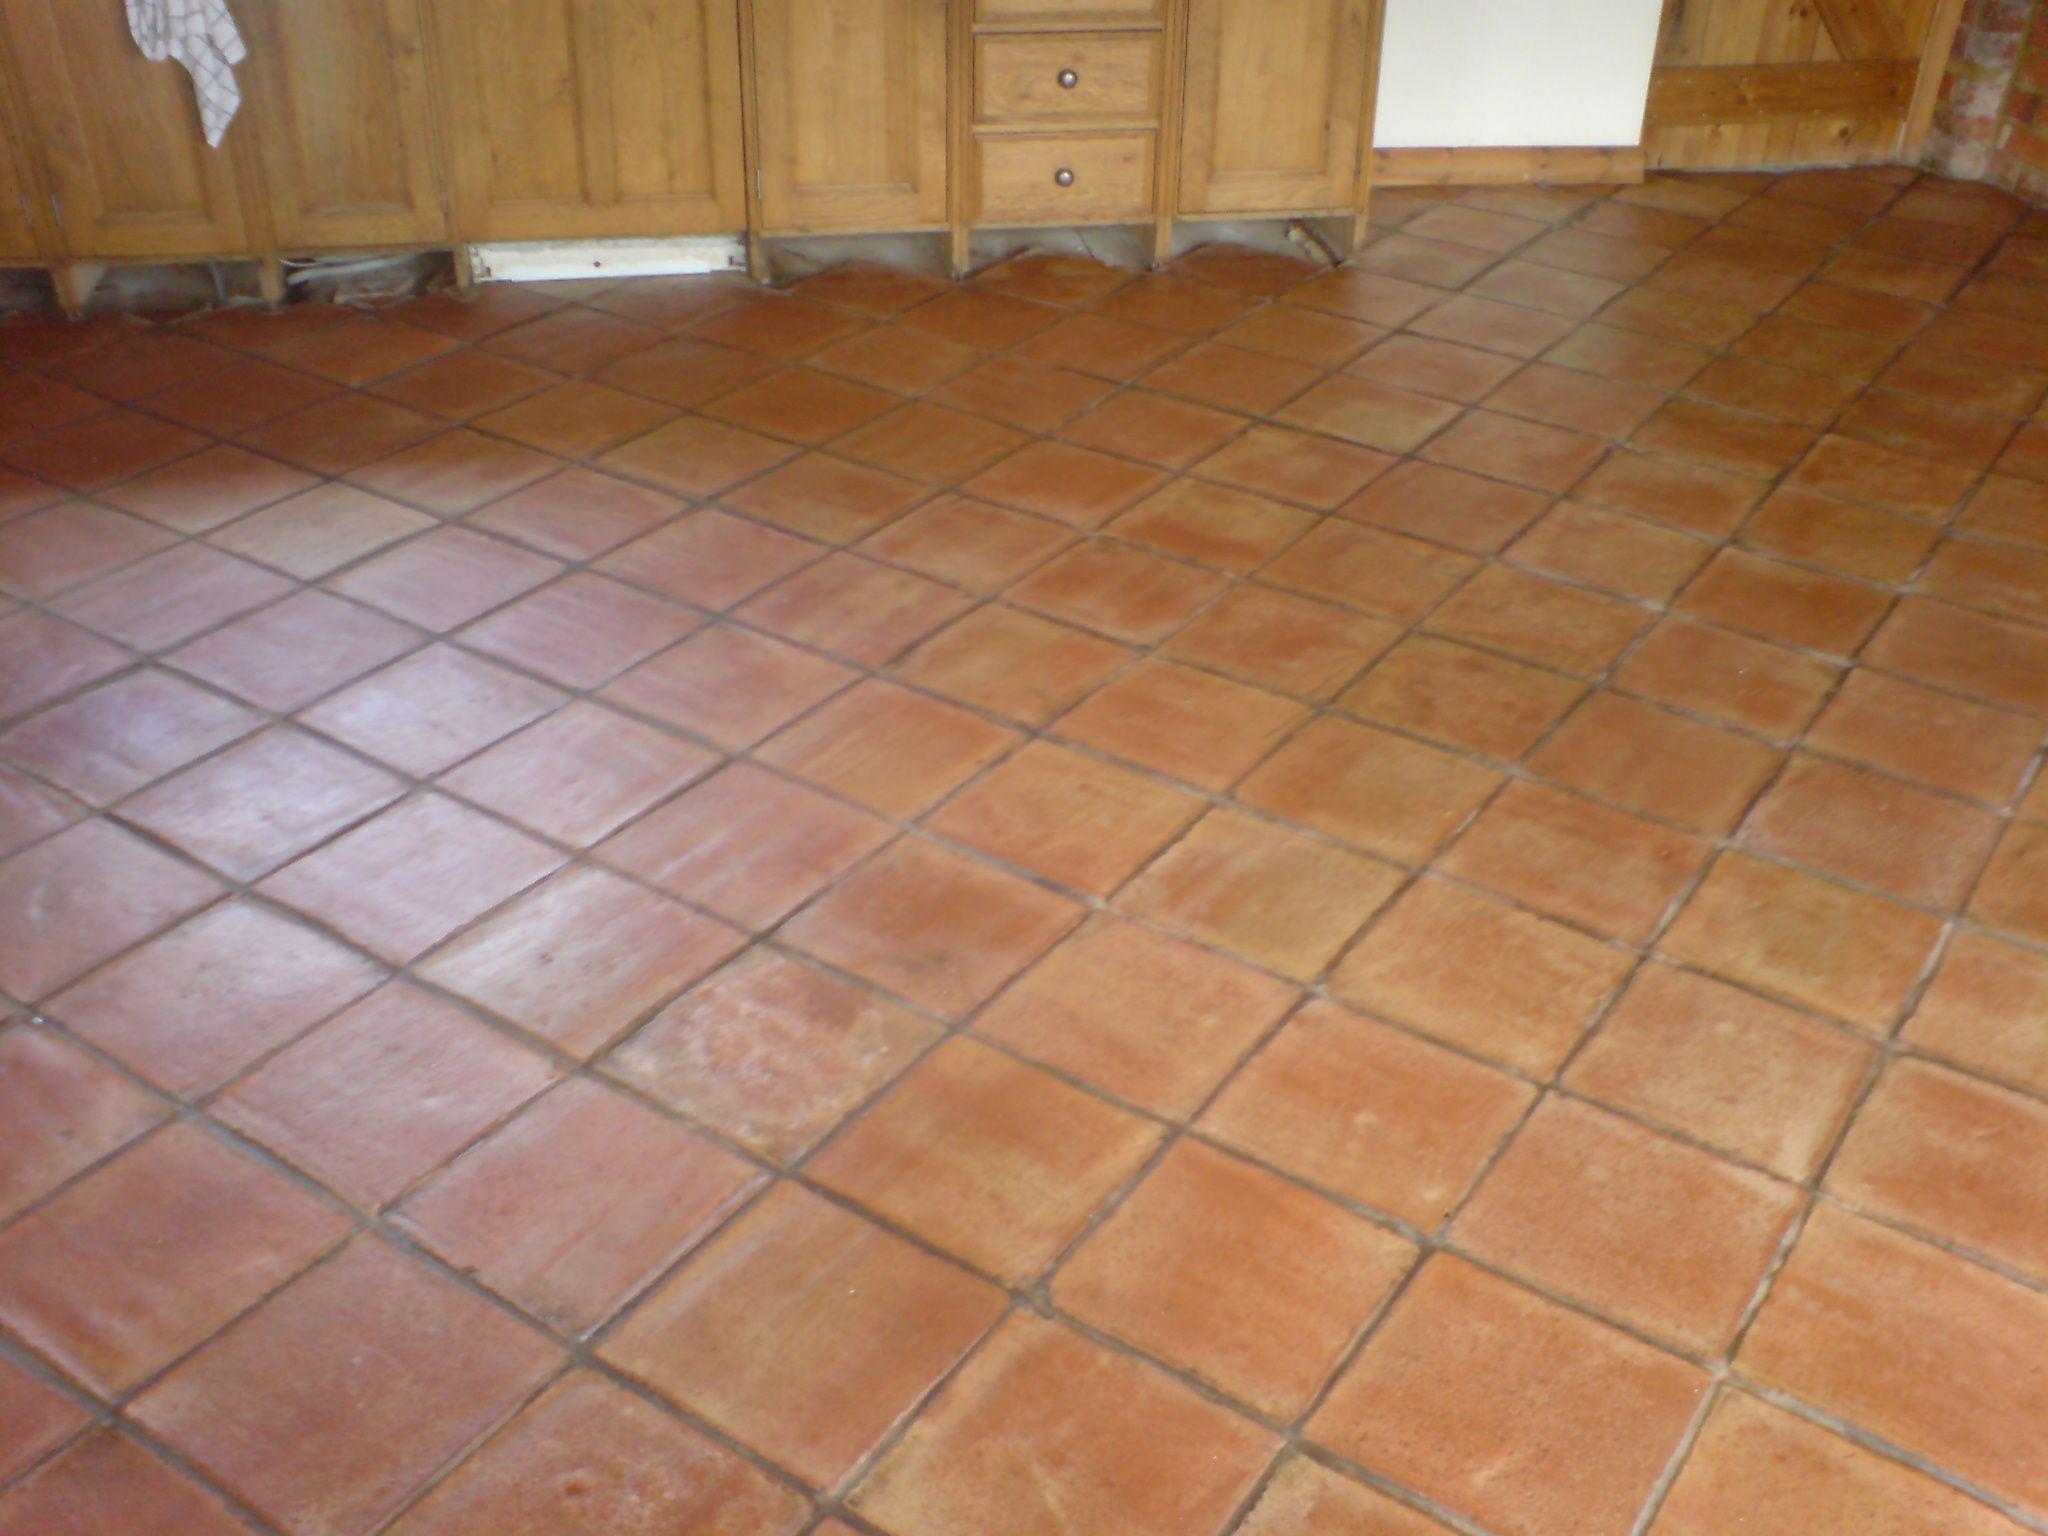 Terracotta Floor Tile Restoration And Renovation Kitchen Floor